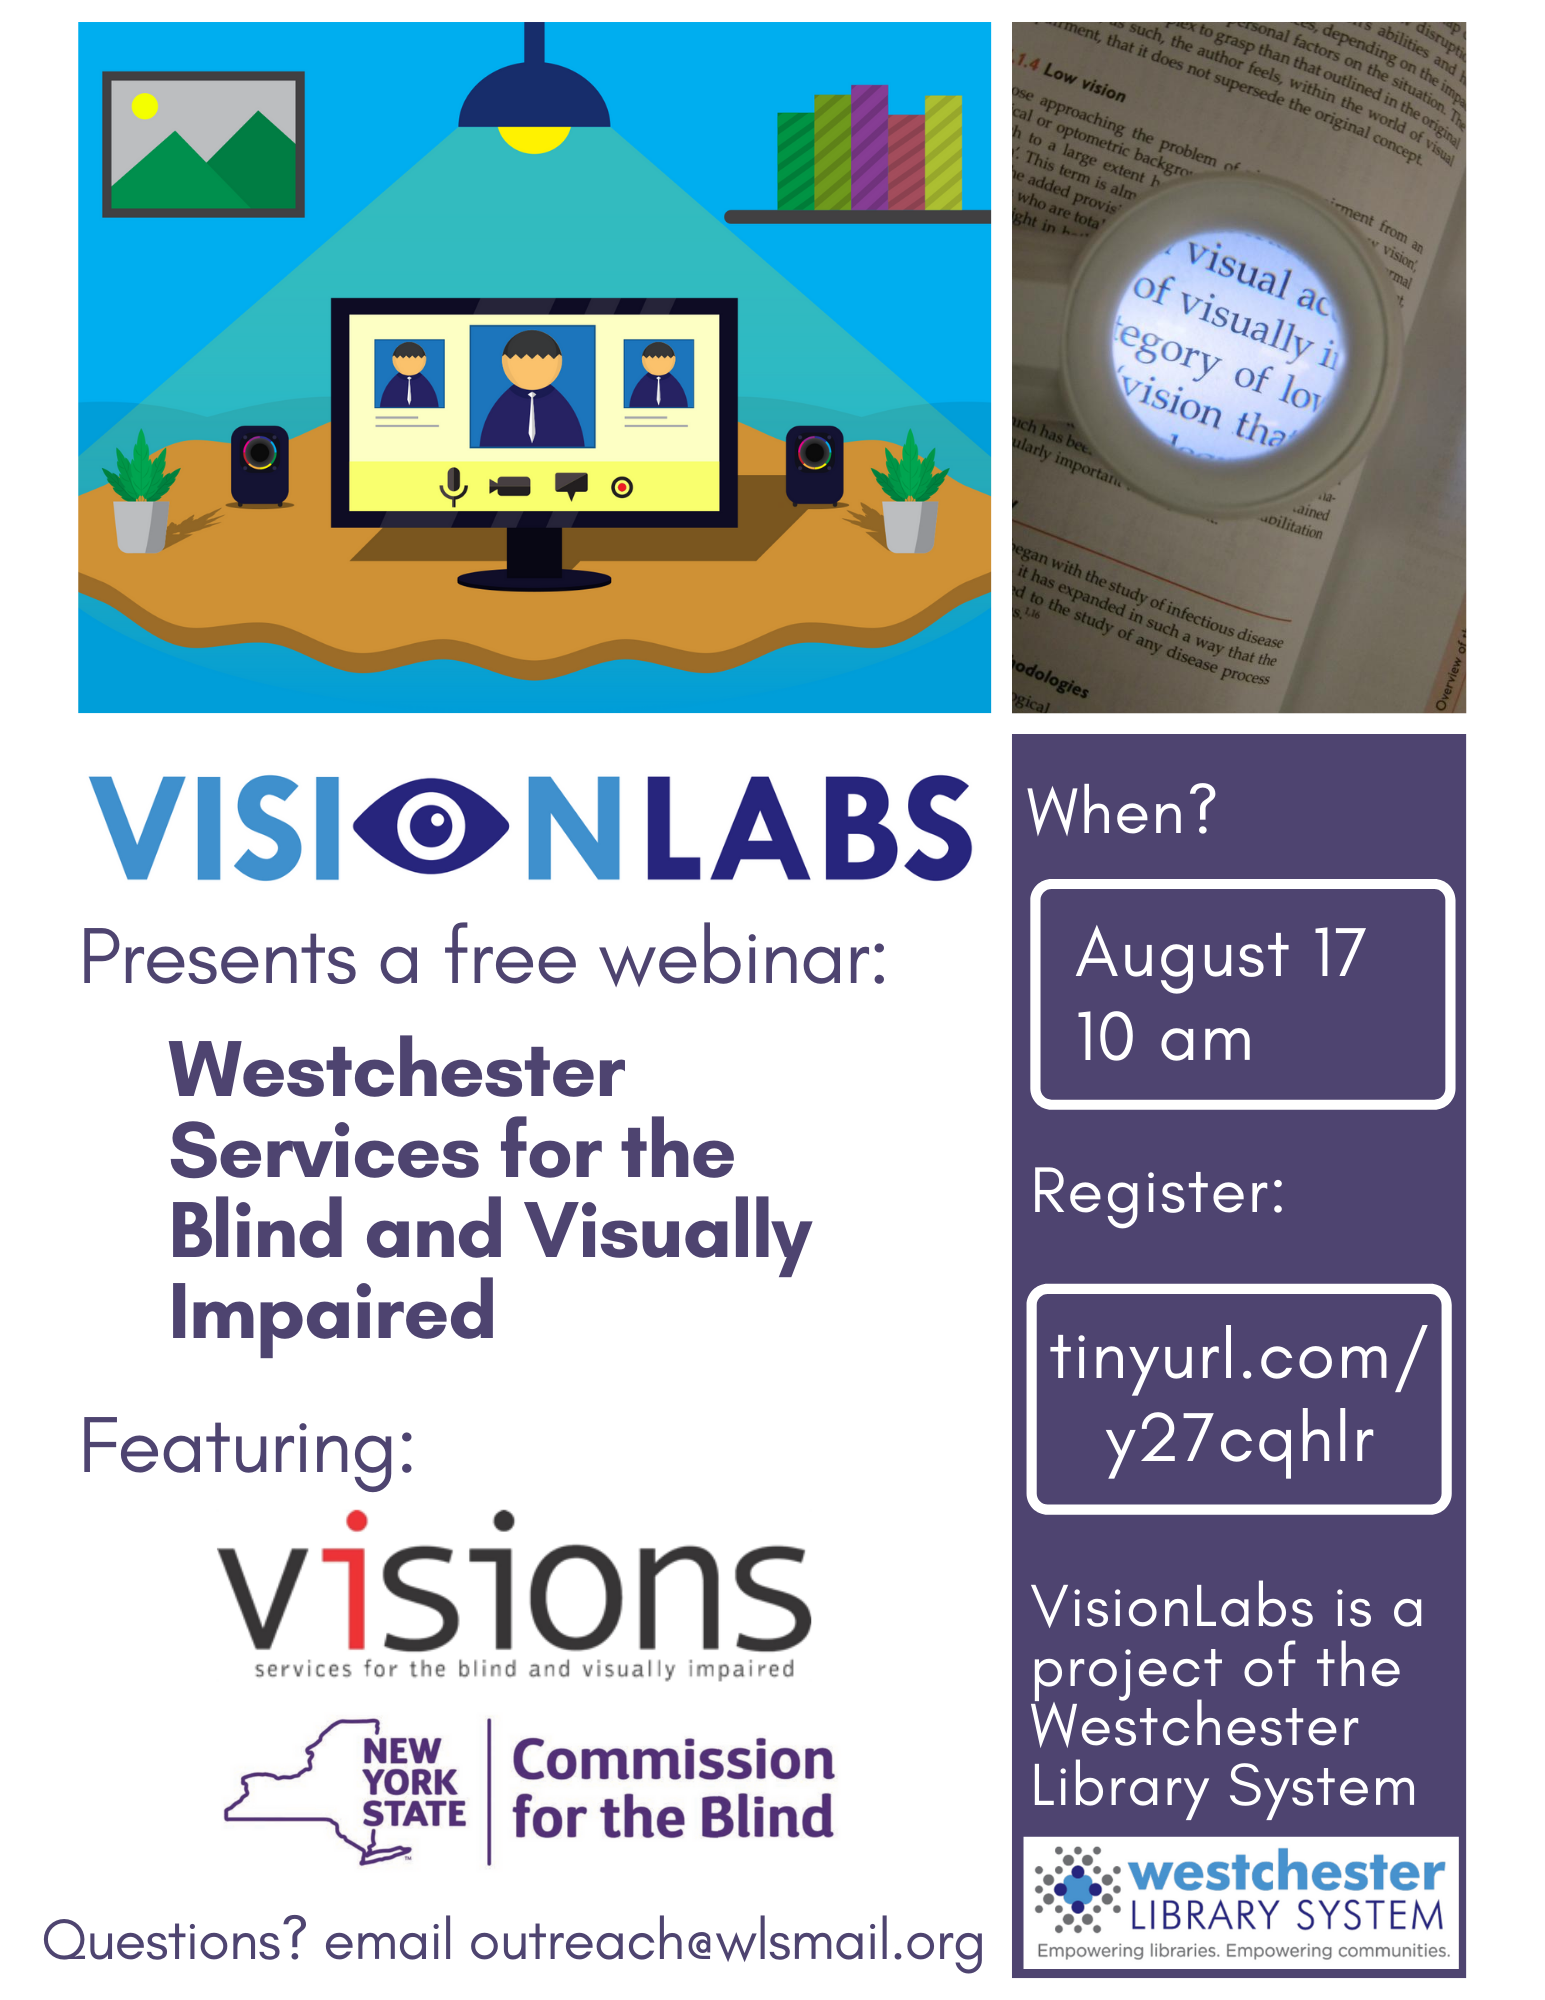 VisionLabs Service Webinar 8.17.20